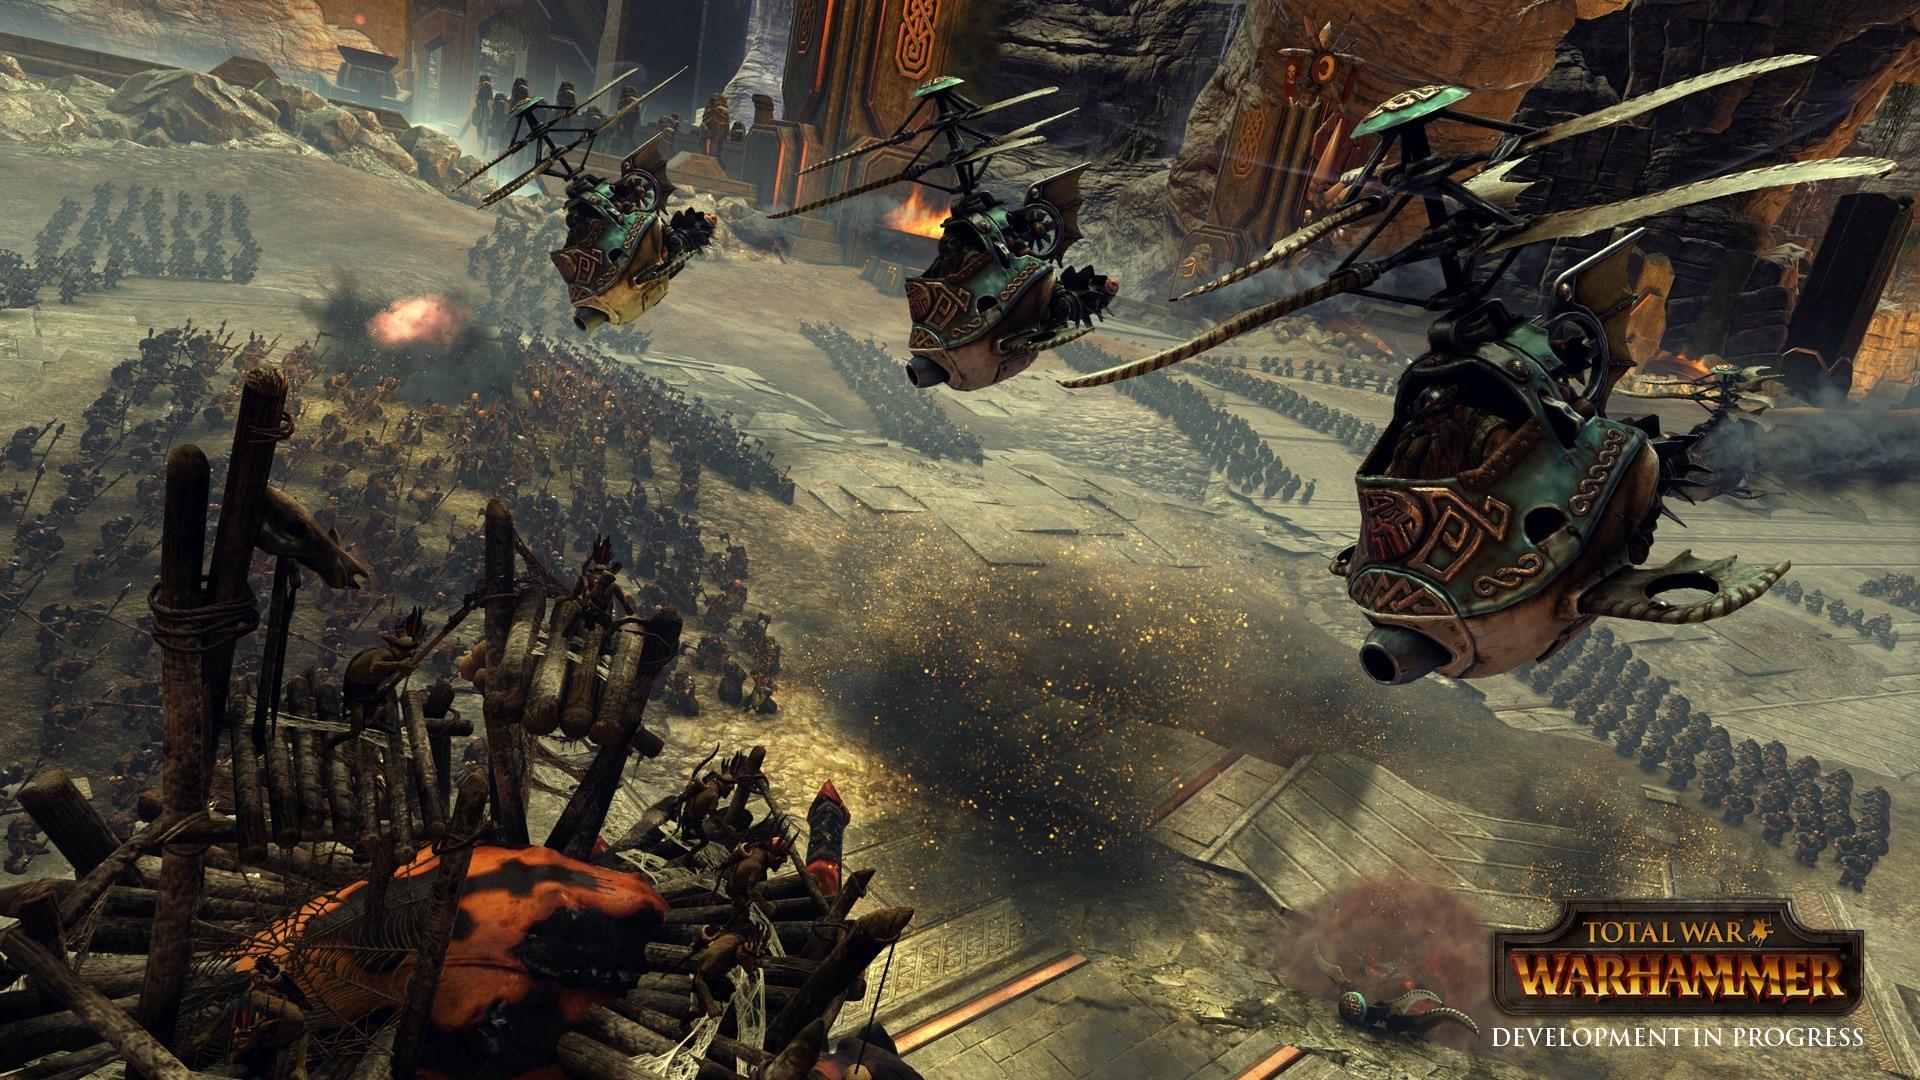 Free Total War: Warhammer Wallpapers 1920×1080 Total War Warhammer  Wallpapers (28 Wallpapers)   Adorable Wallpapers   Games   Pinterest   Total  war, …